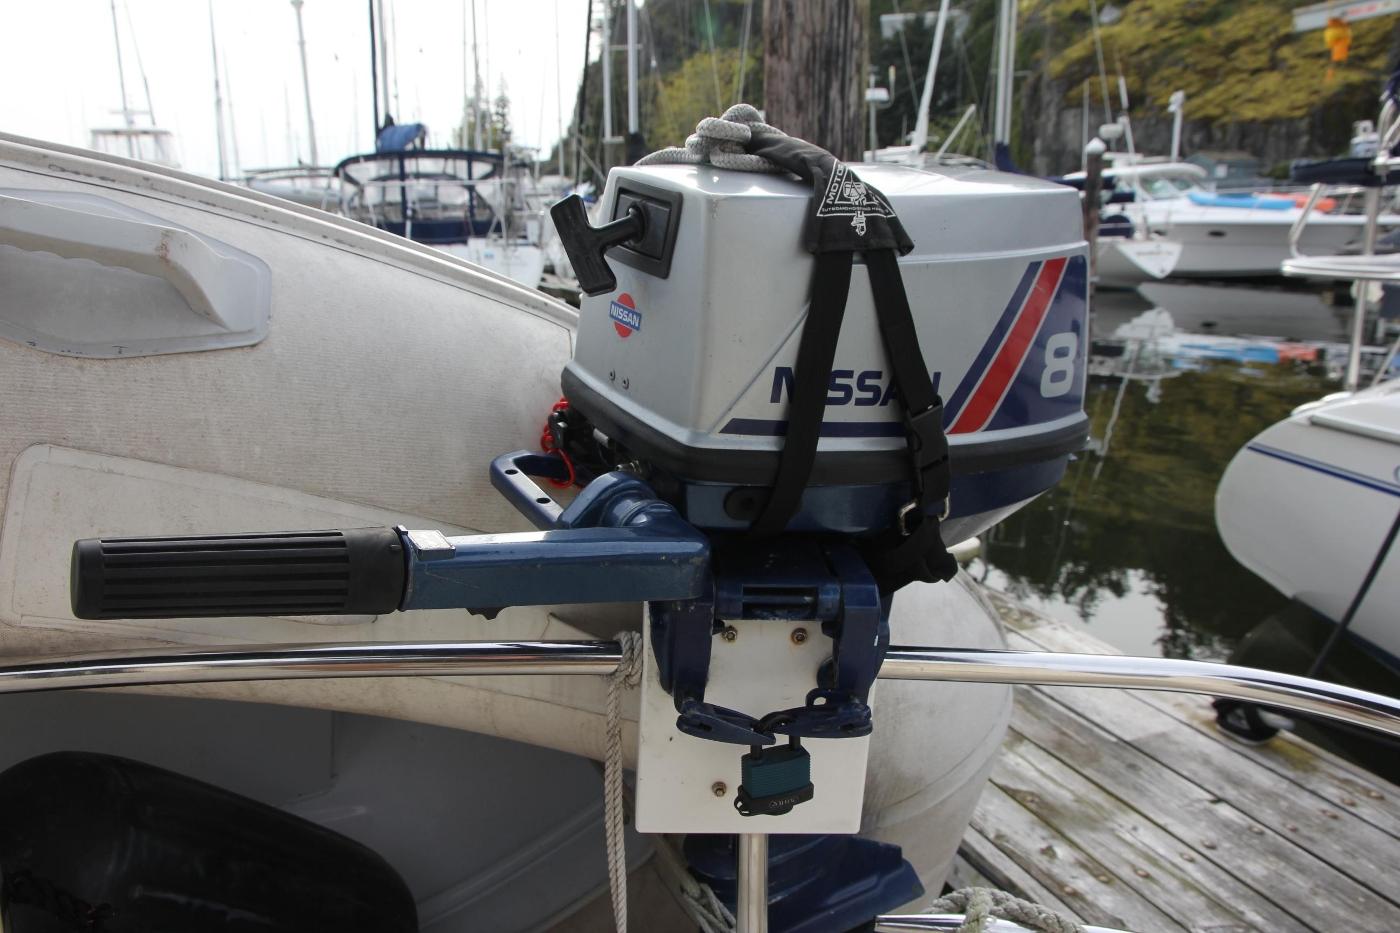 2001 Nordic Tugs 32 Pilothouse, Outboard